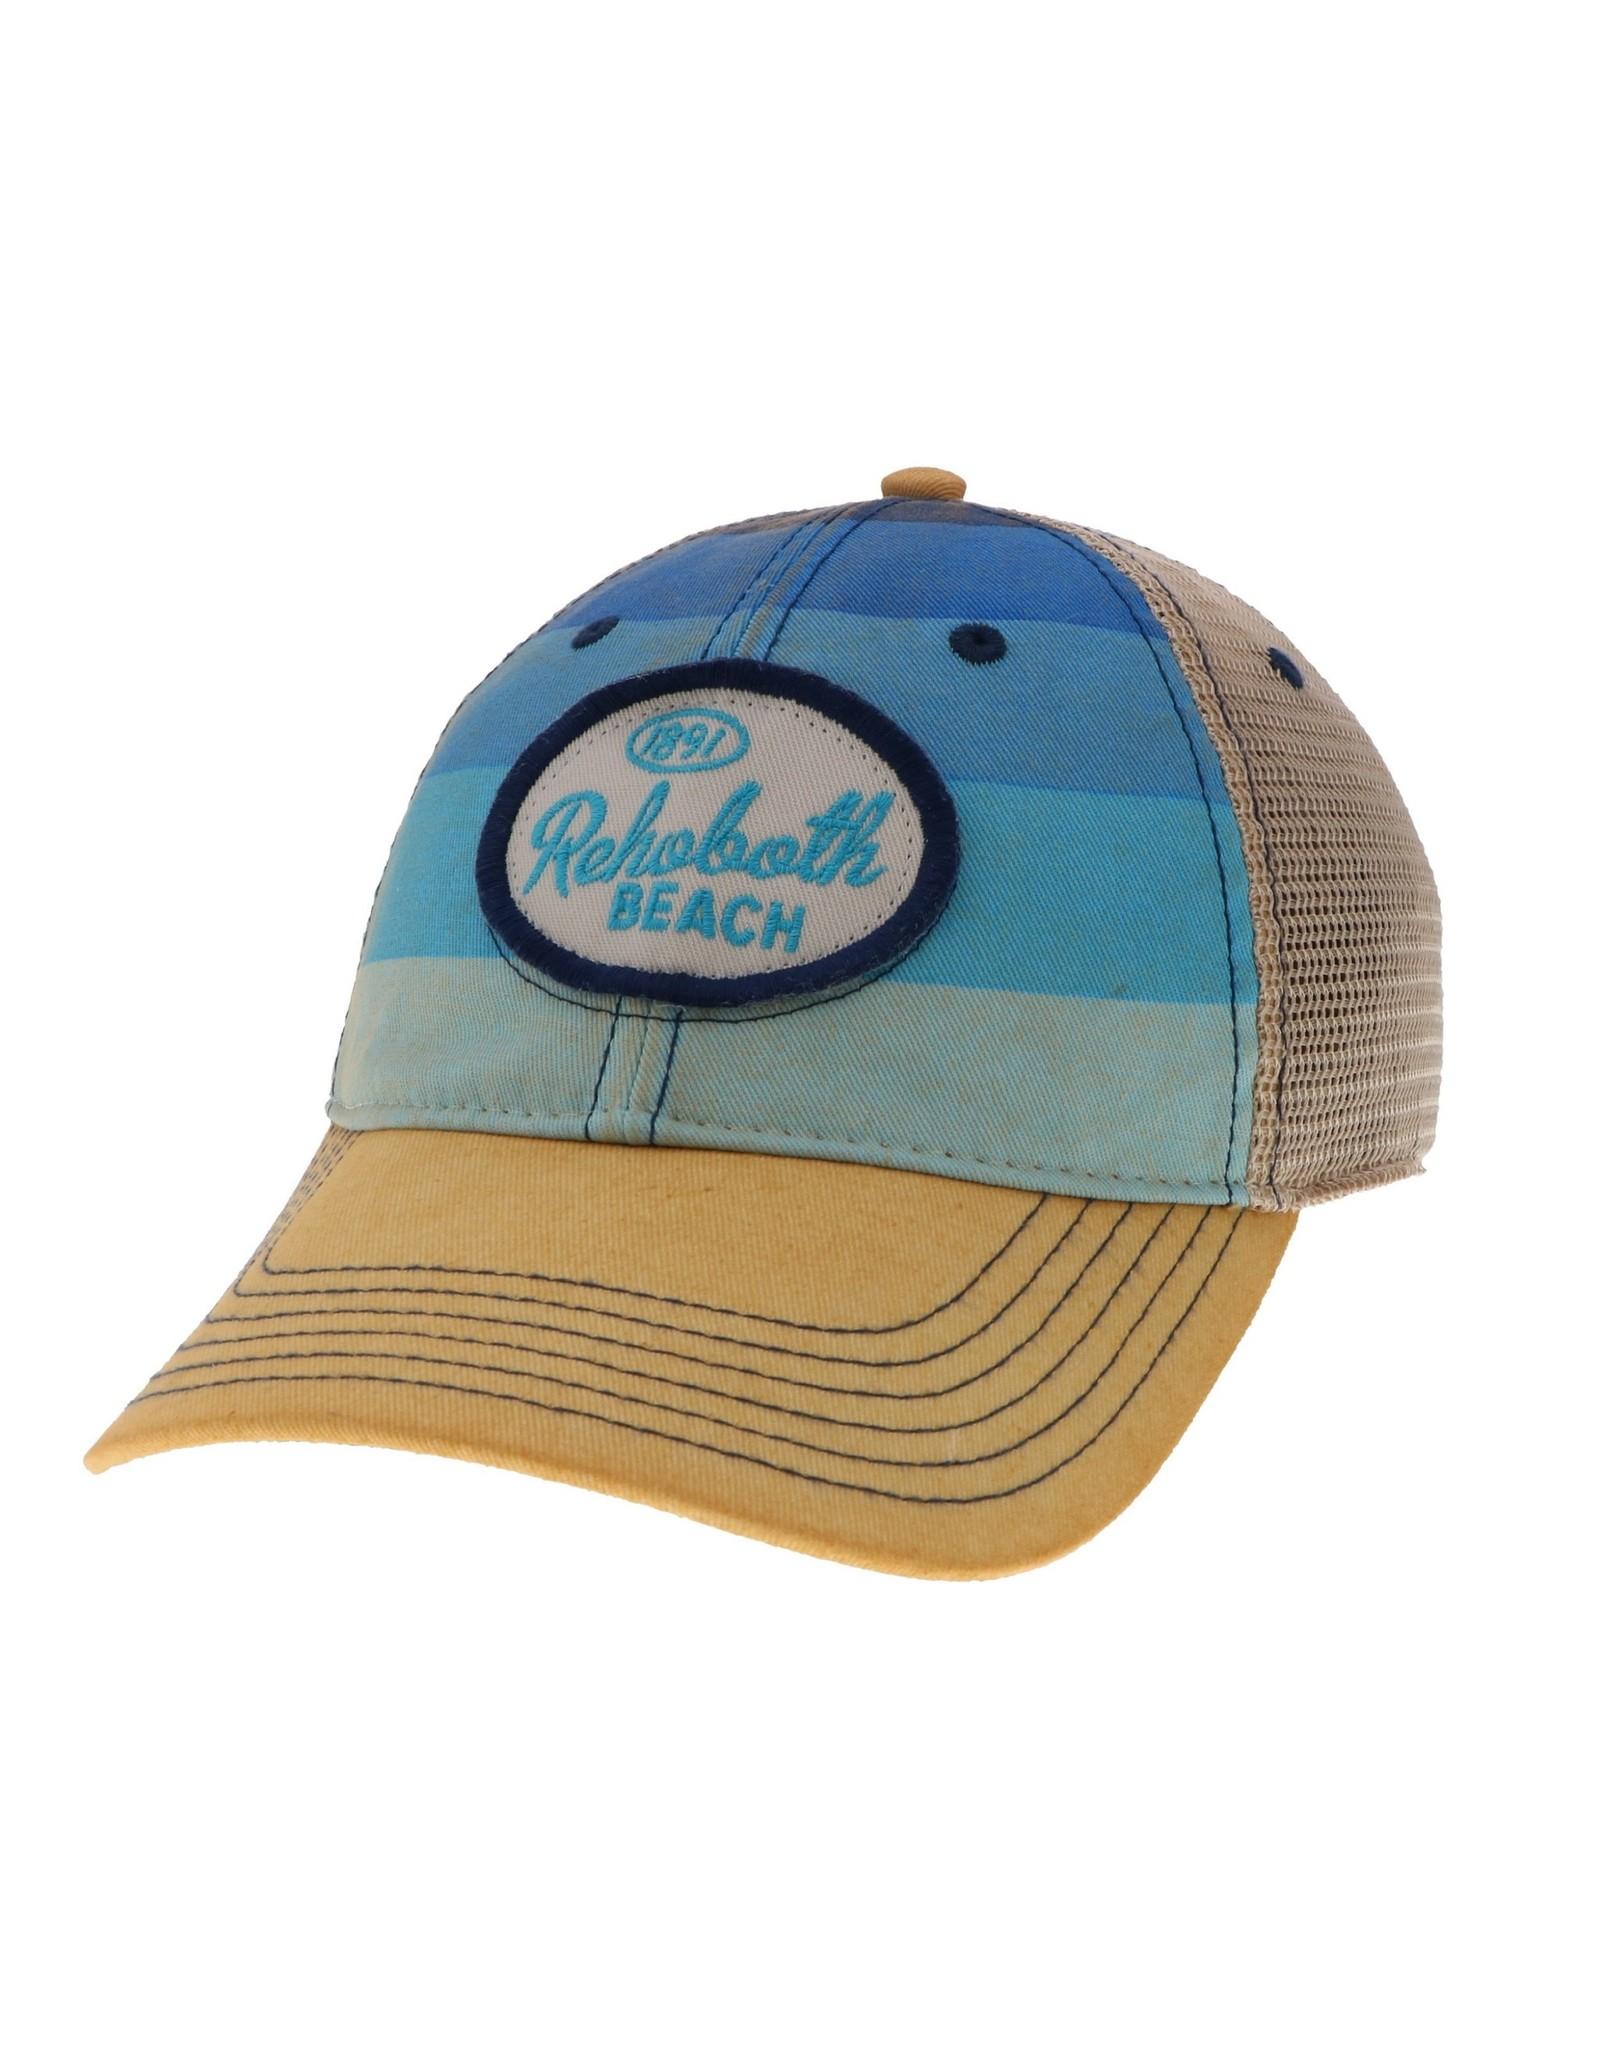 LEGACY ATHLETICS LEGACY OLD FAVORITE TRUCKER HAT BLUE STRIPE SPANKY OVAL